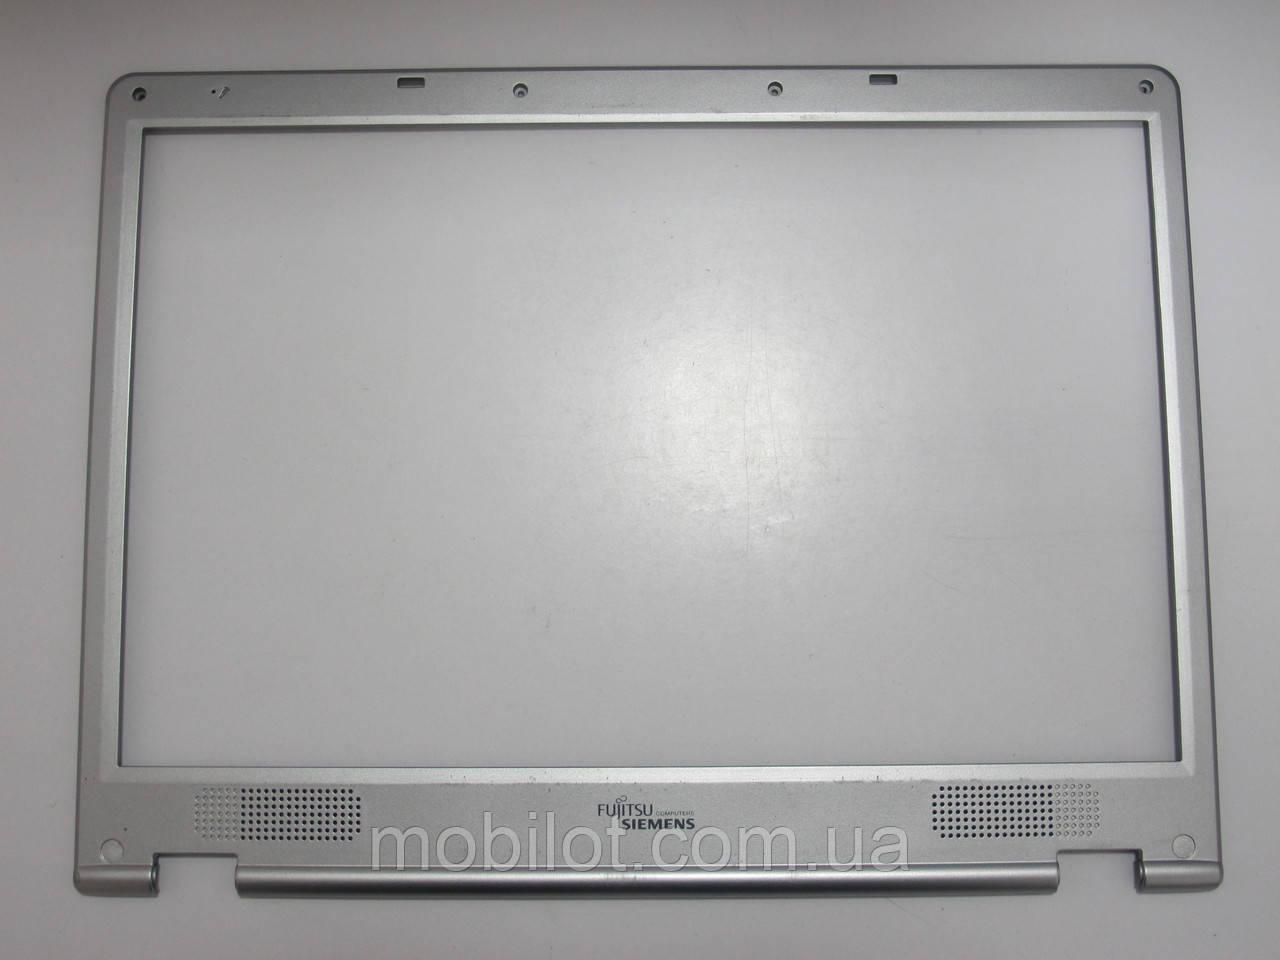 Часть корпуса (Рамка) Fujitsu Siemens Amilo D-1840W (NZ-5065)